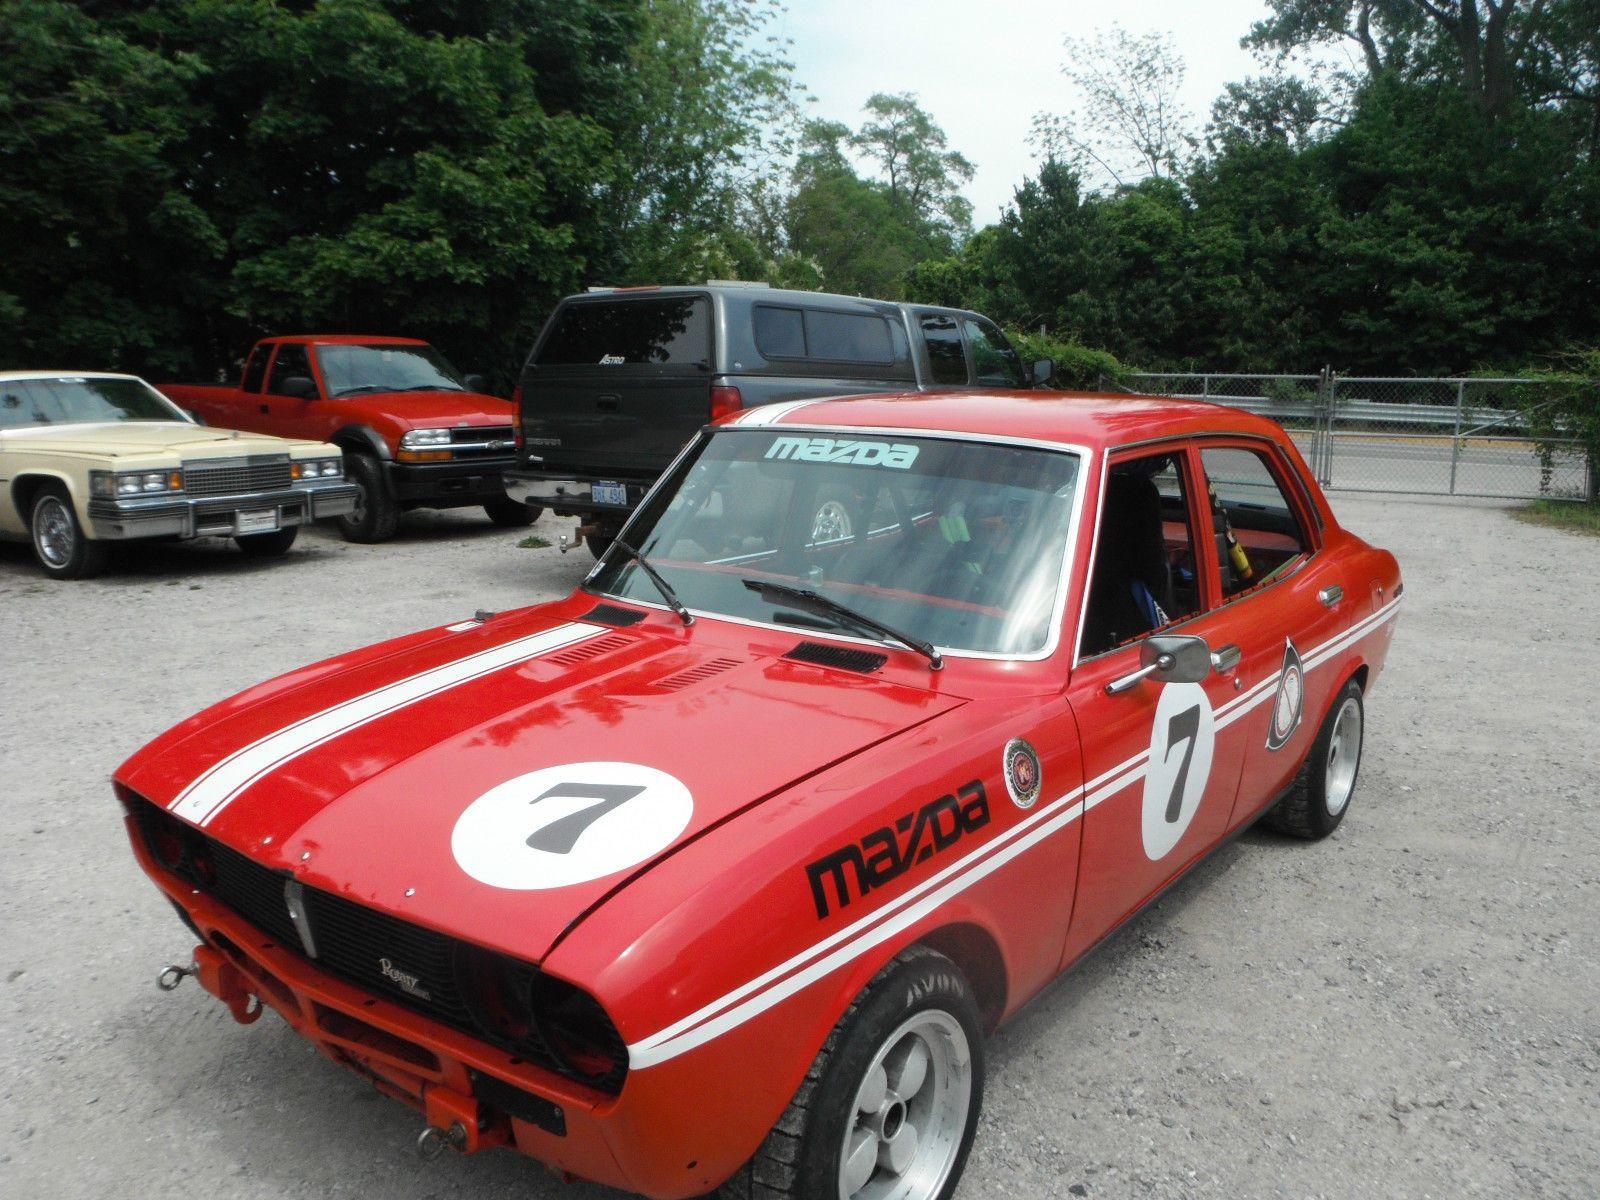 1972 Mazda RX2 vintage race car | Vintage race car, Vintage racing ...